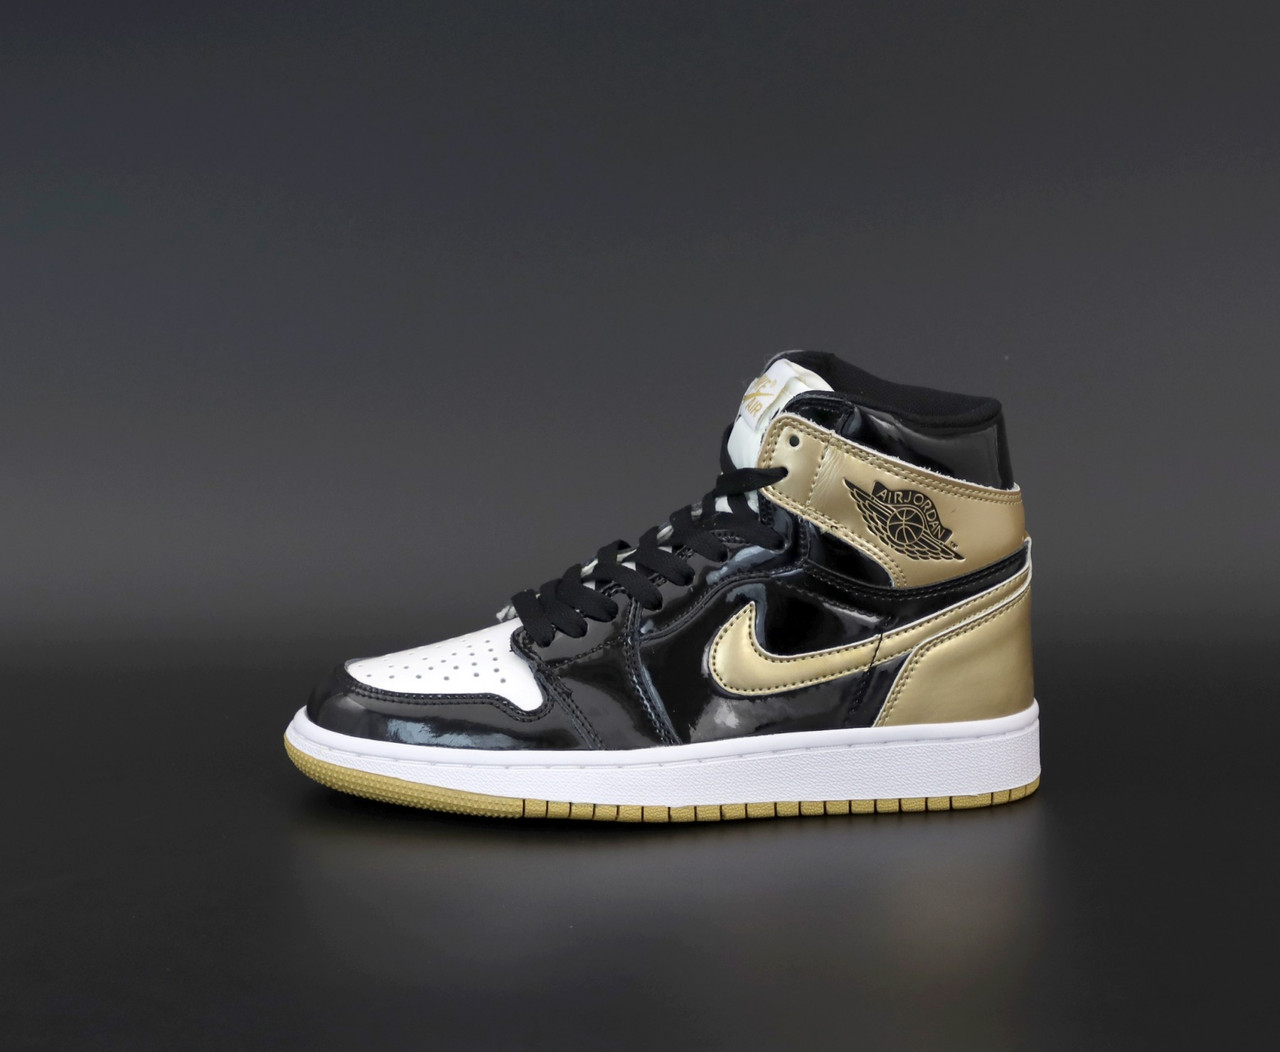 Женские кроссовки в стиле Nike Air Jordan 1 Retro (black/khaki), Найк Аир Джордан 1 ретро (Реплика ААА)